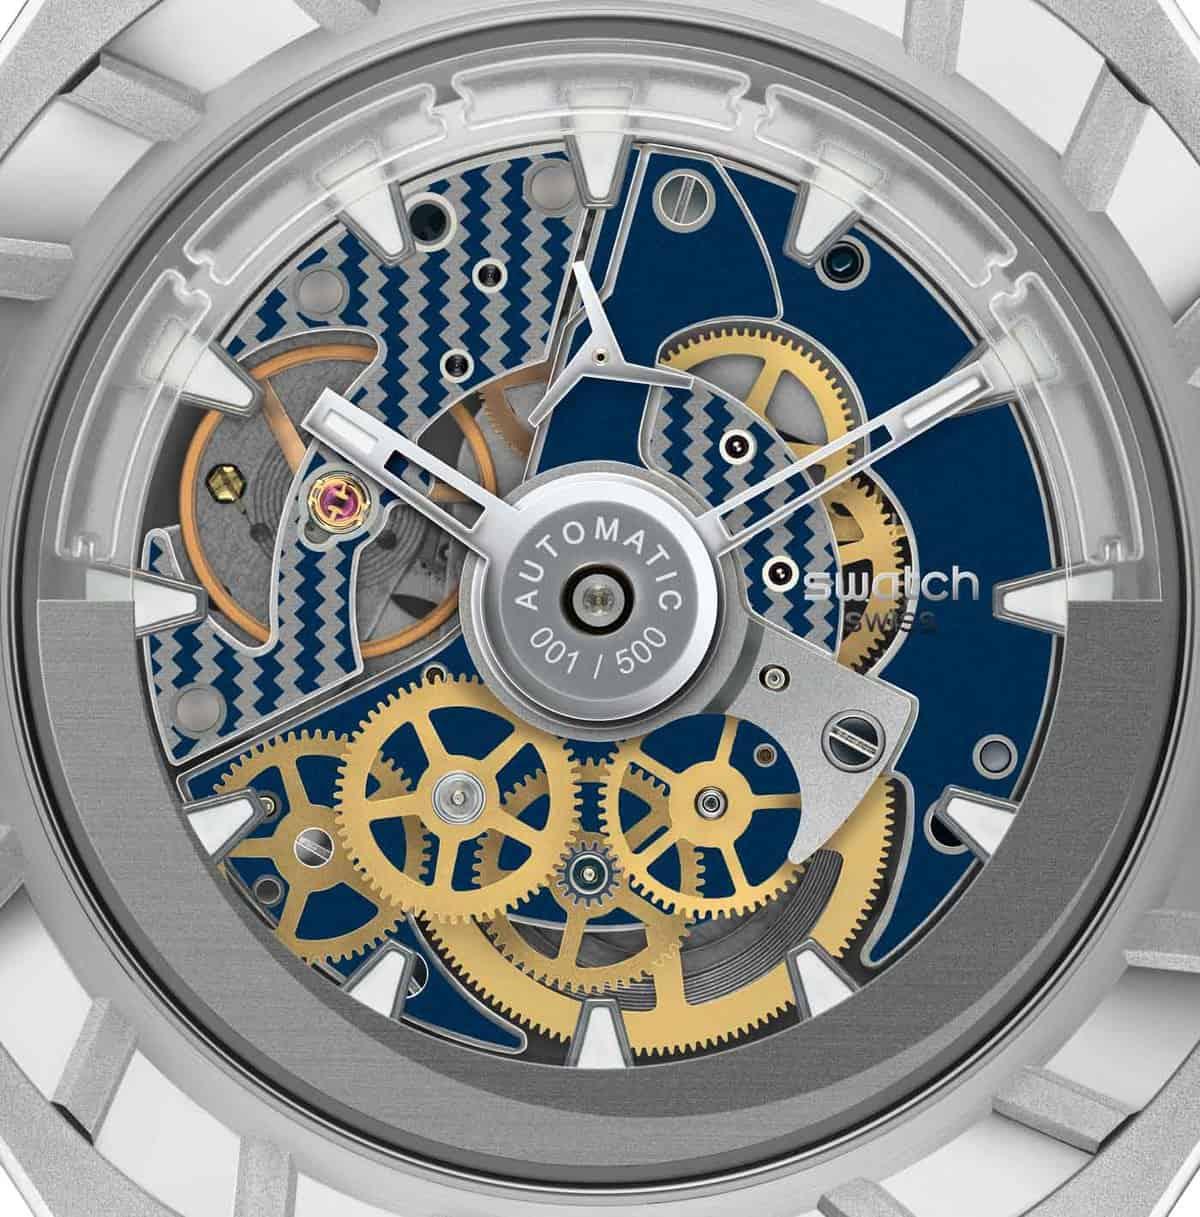 Swatch-Flymagic-Sistem51-Reversed-2019-1